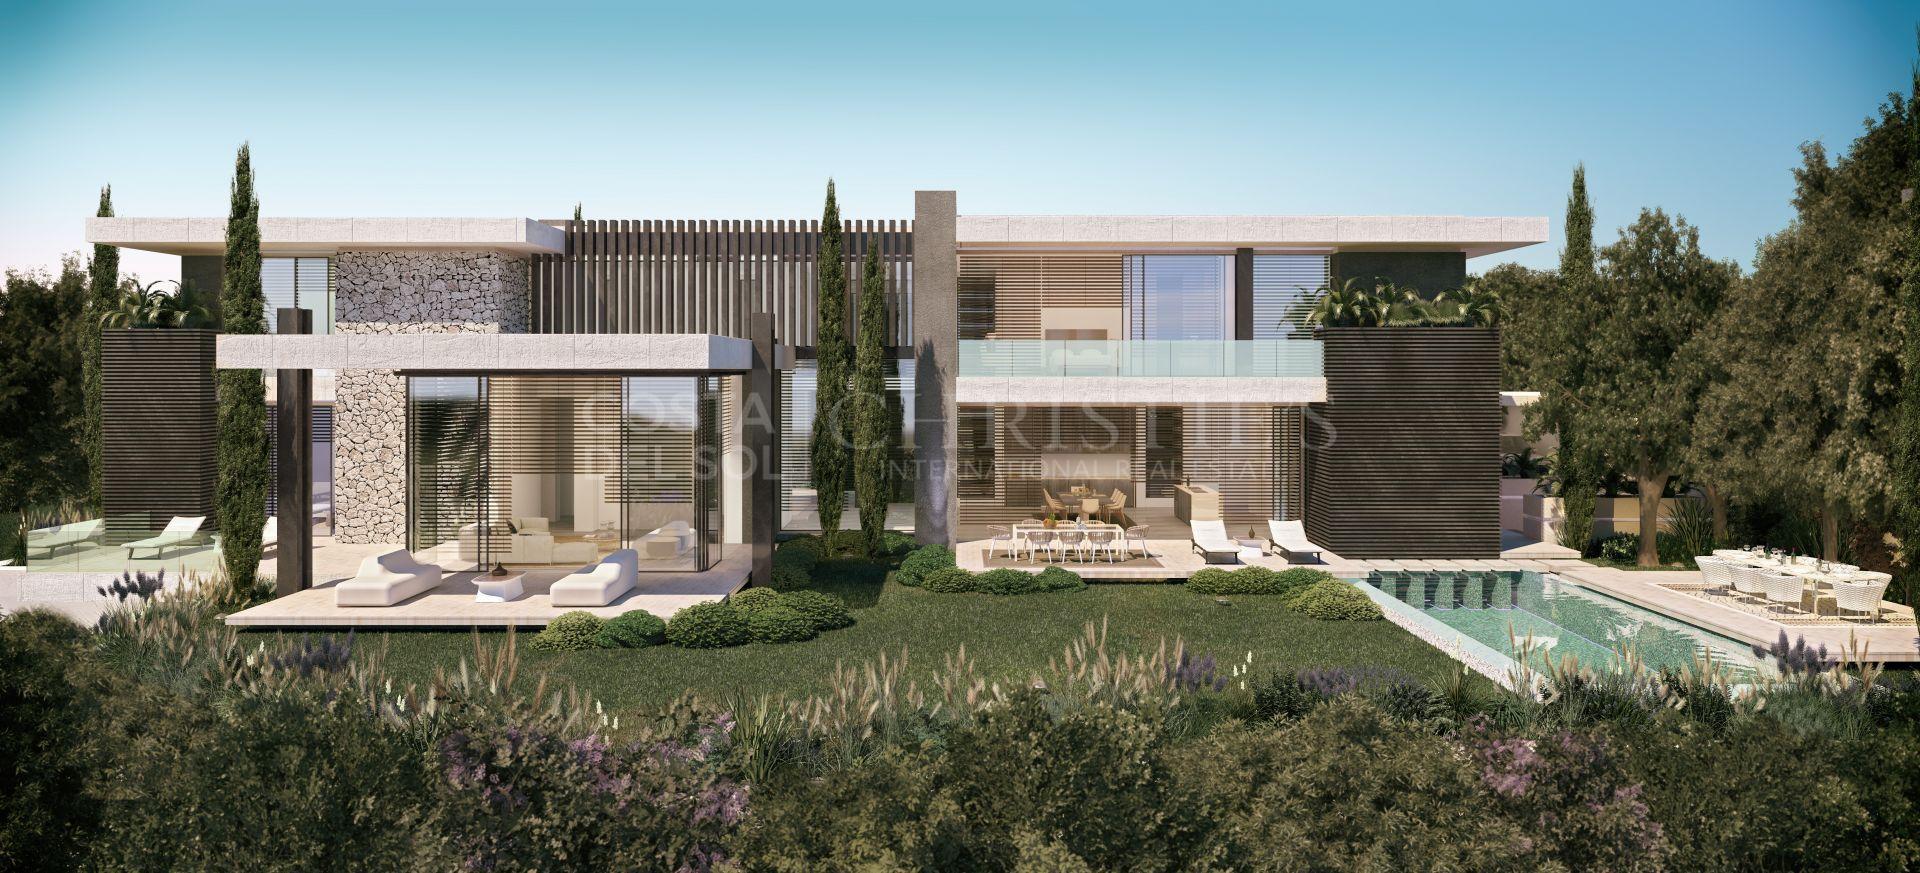 Exceptional Turnkey Villas - The Hills | Christie's International Real Estate